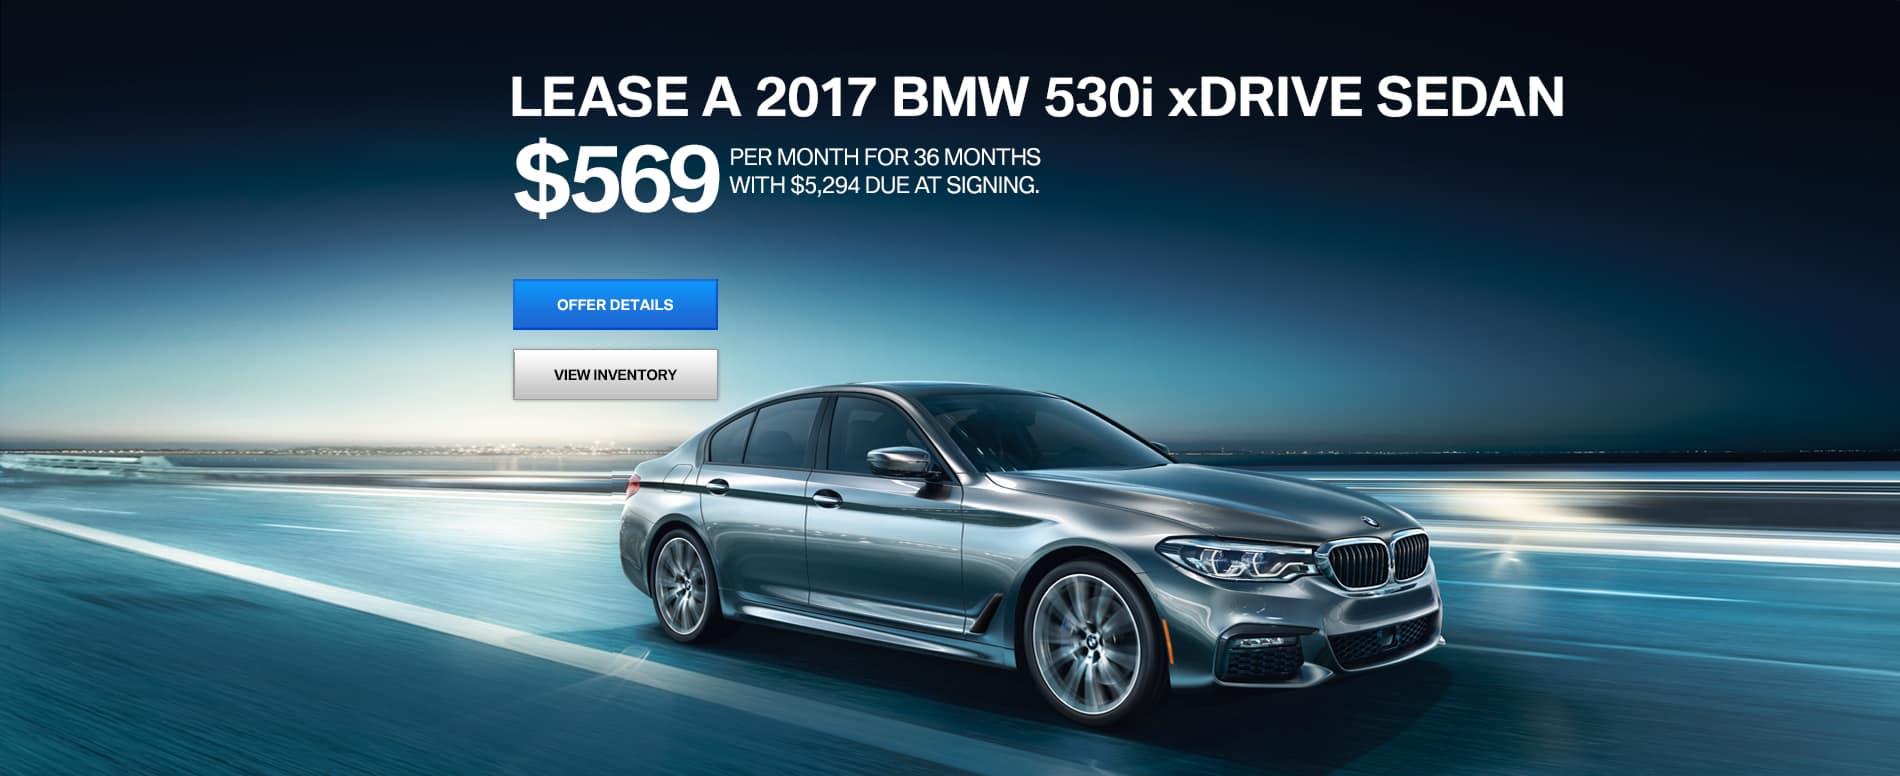 2017_530i_xdrive_sedan_1900x776